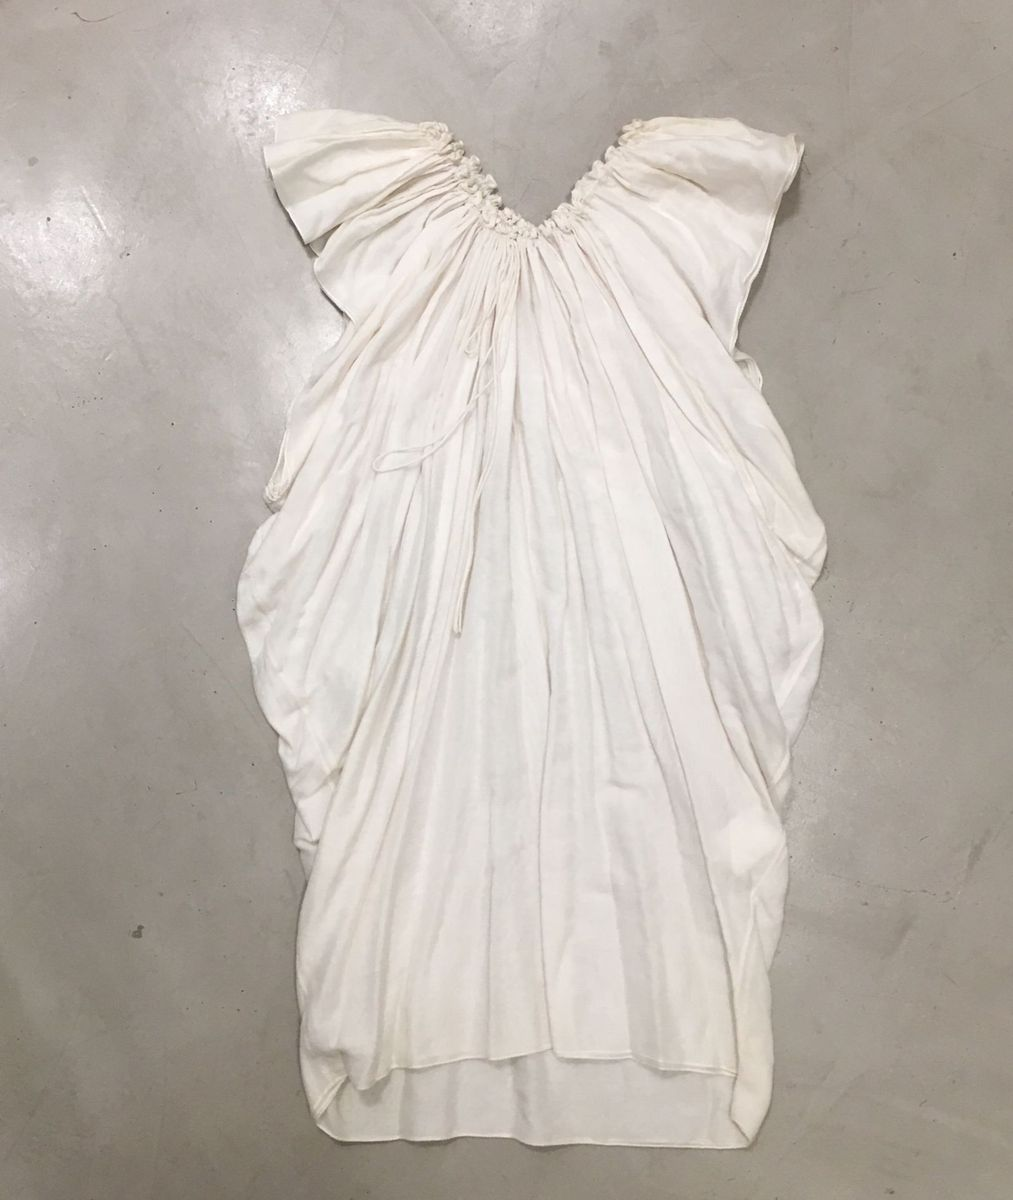 vestido/blusa gloria coelho - vestidos gloria coelho